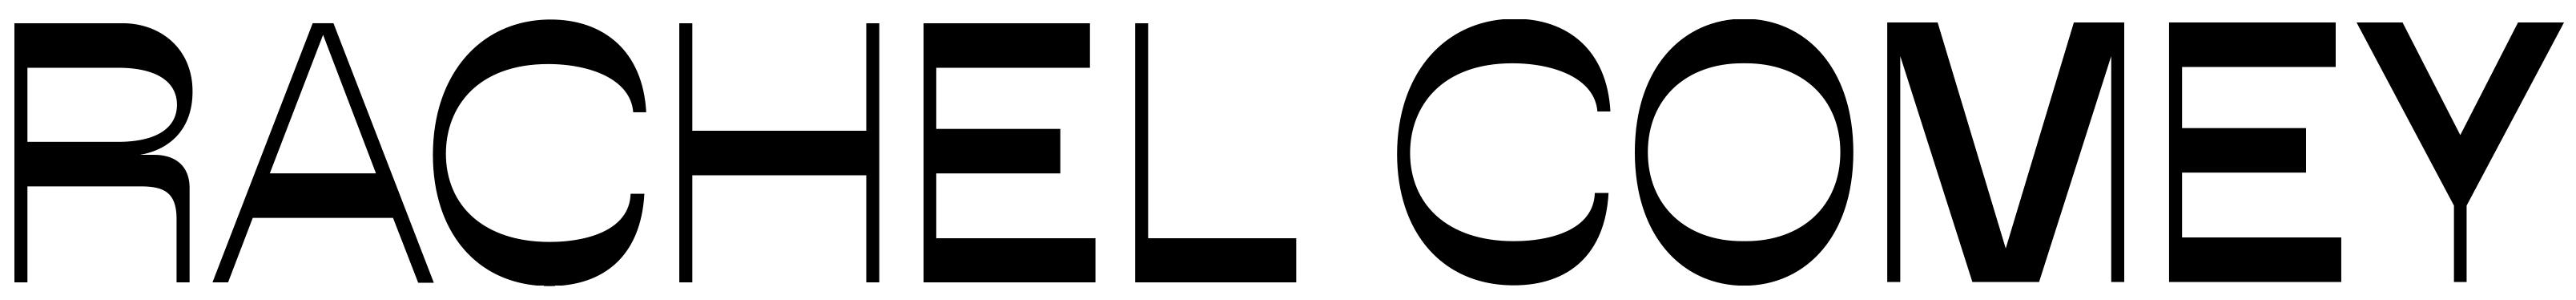 Rachel Comey logo